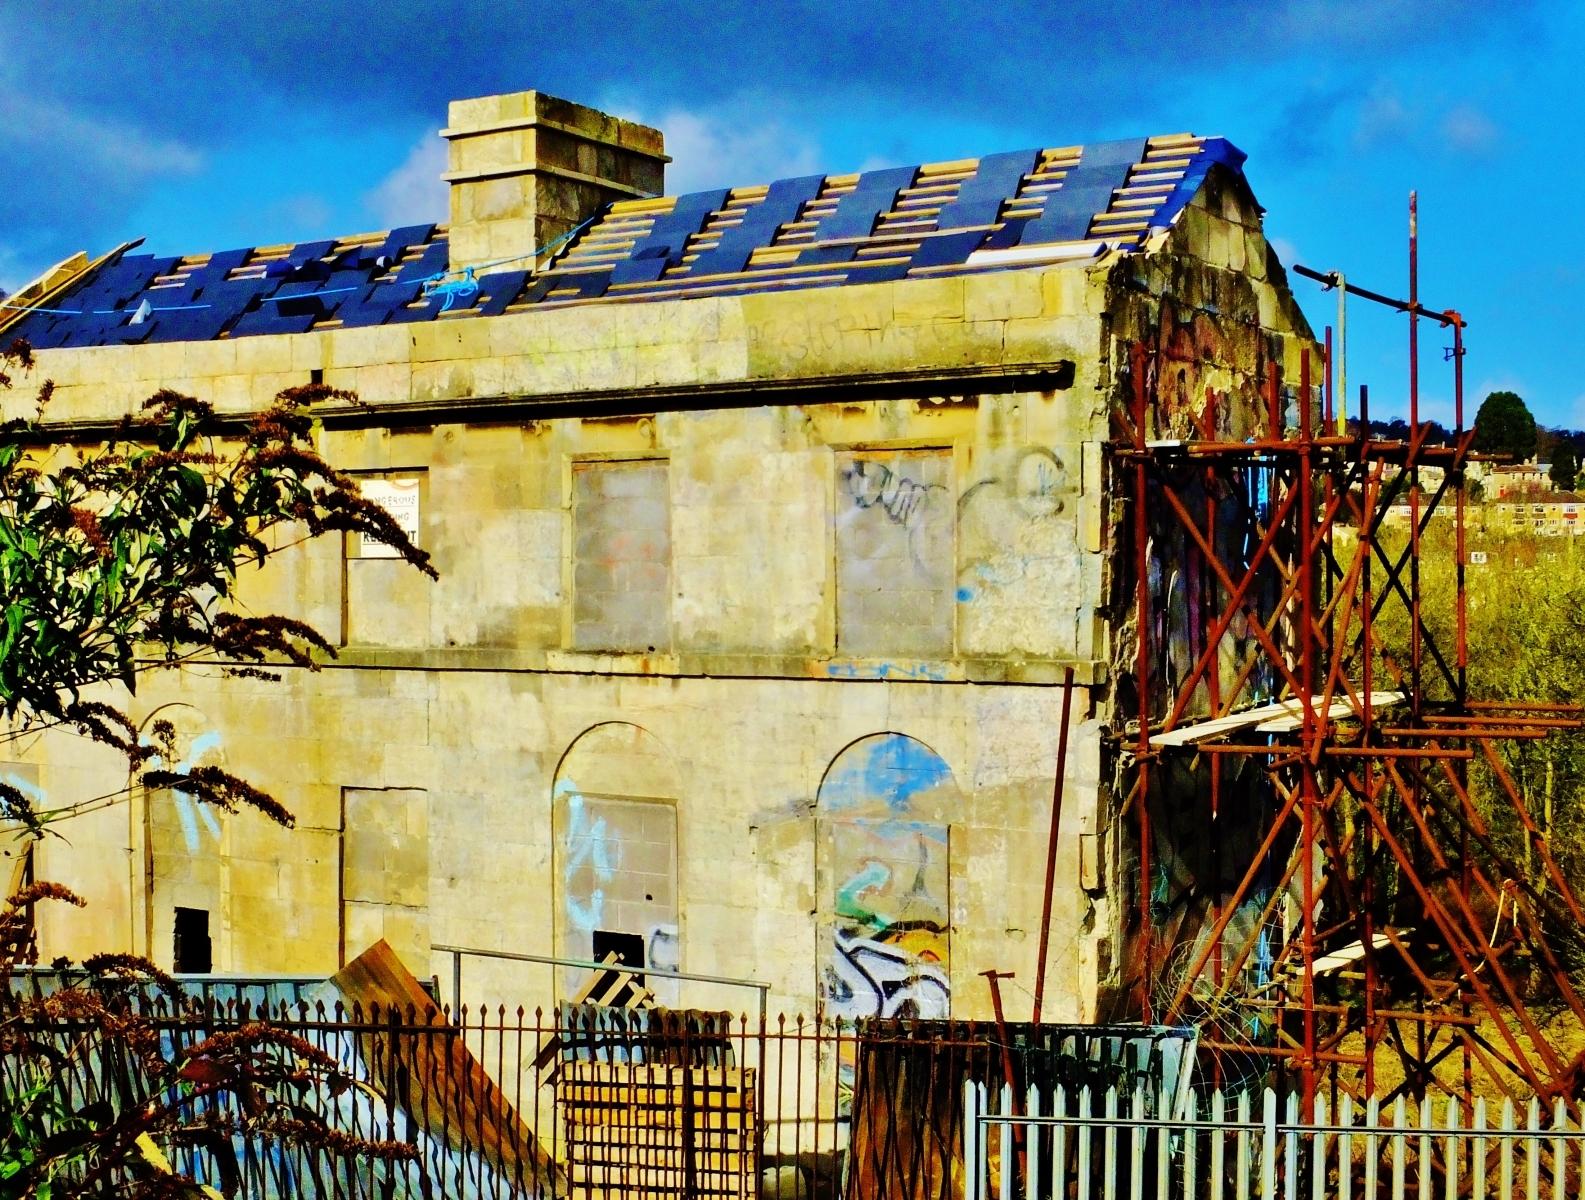 Paul Williams_Abandoned Renovations_None